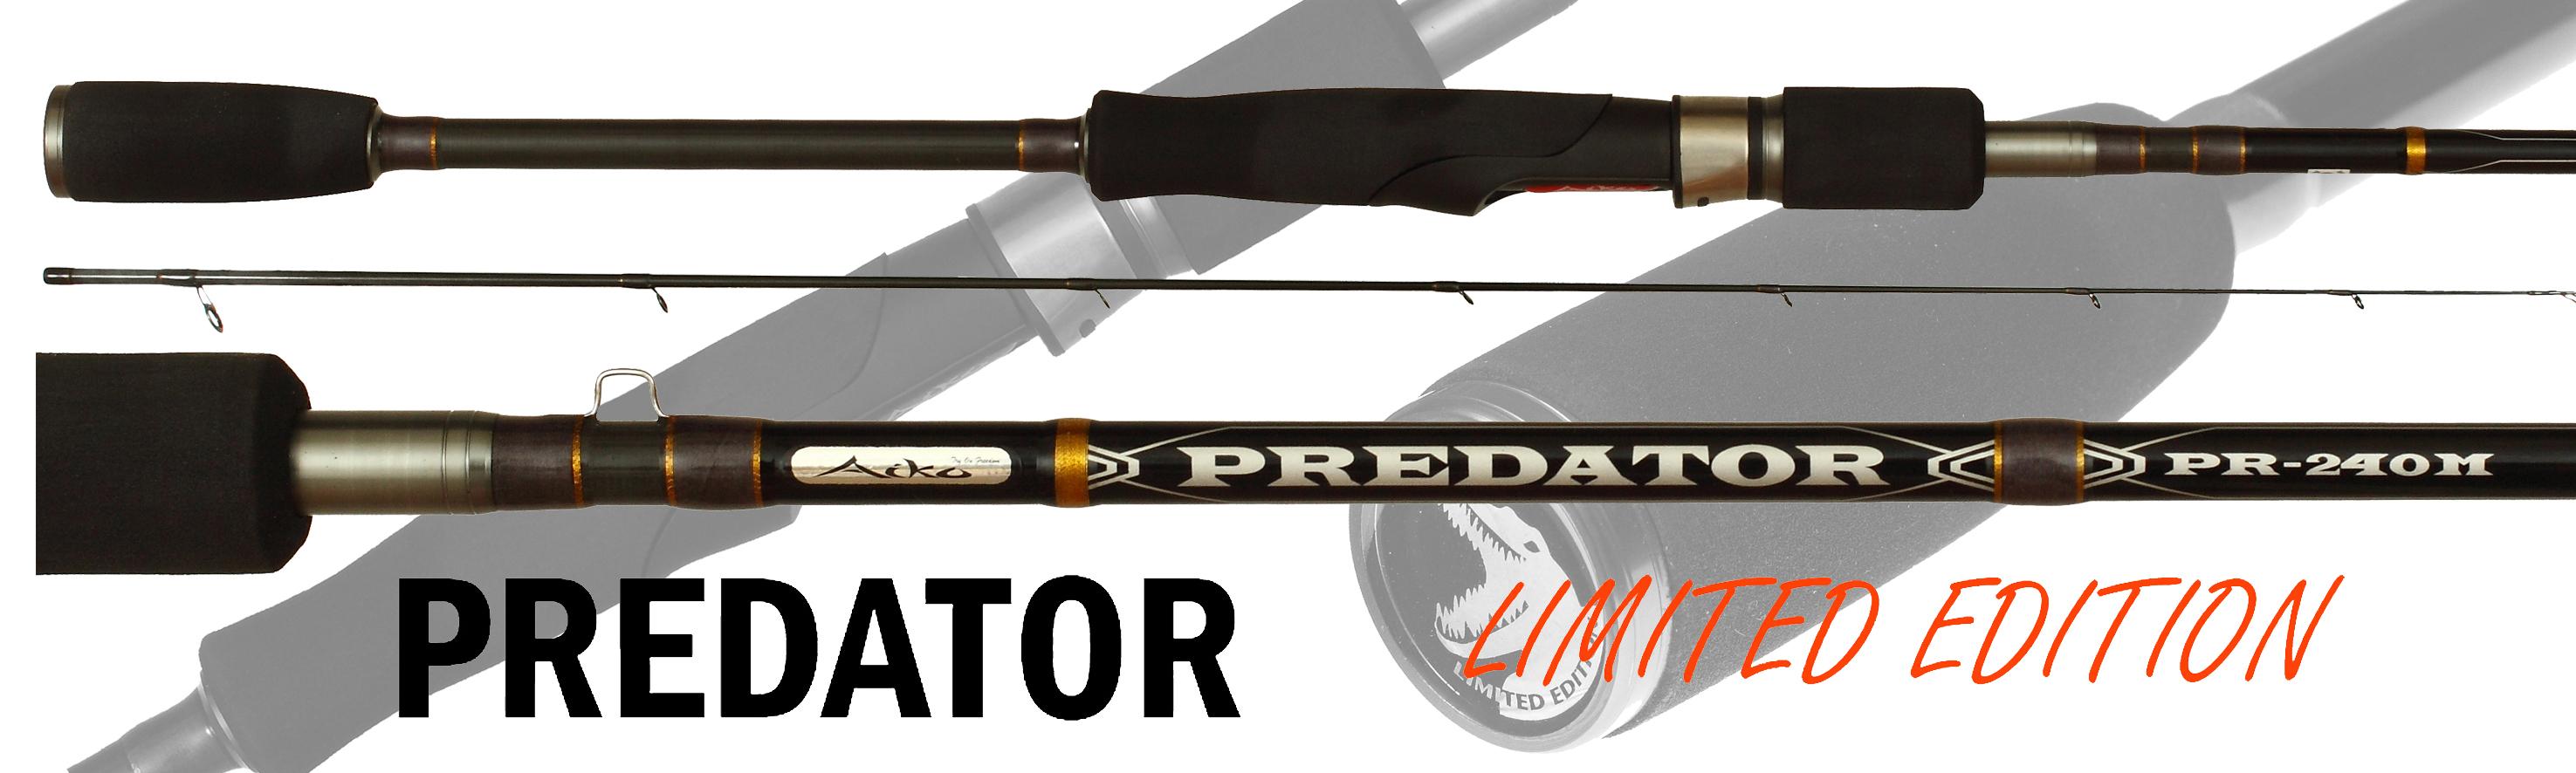 Predator..